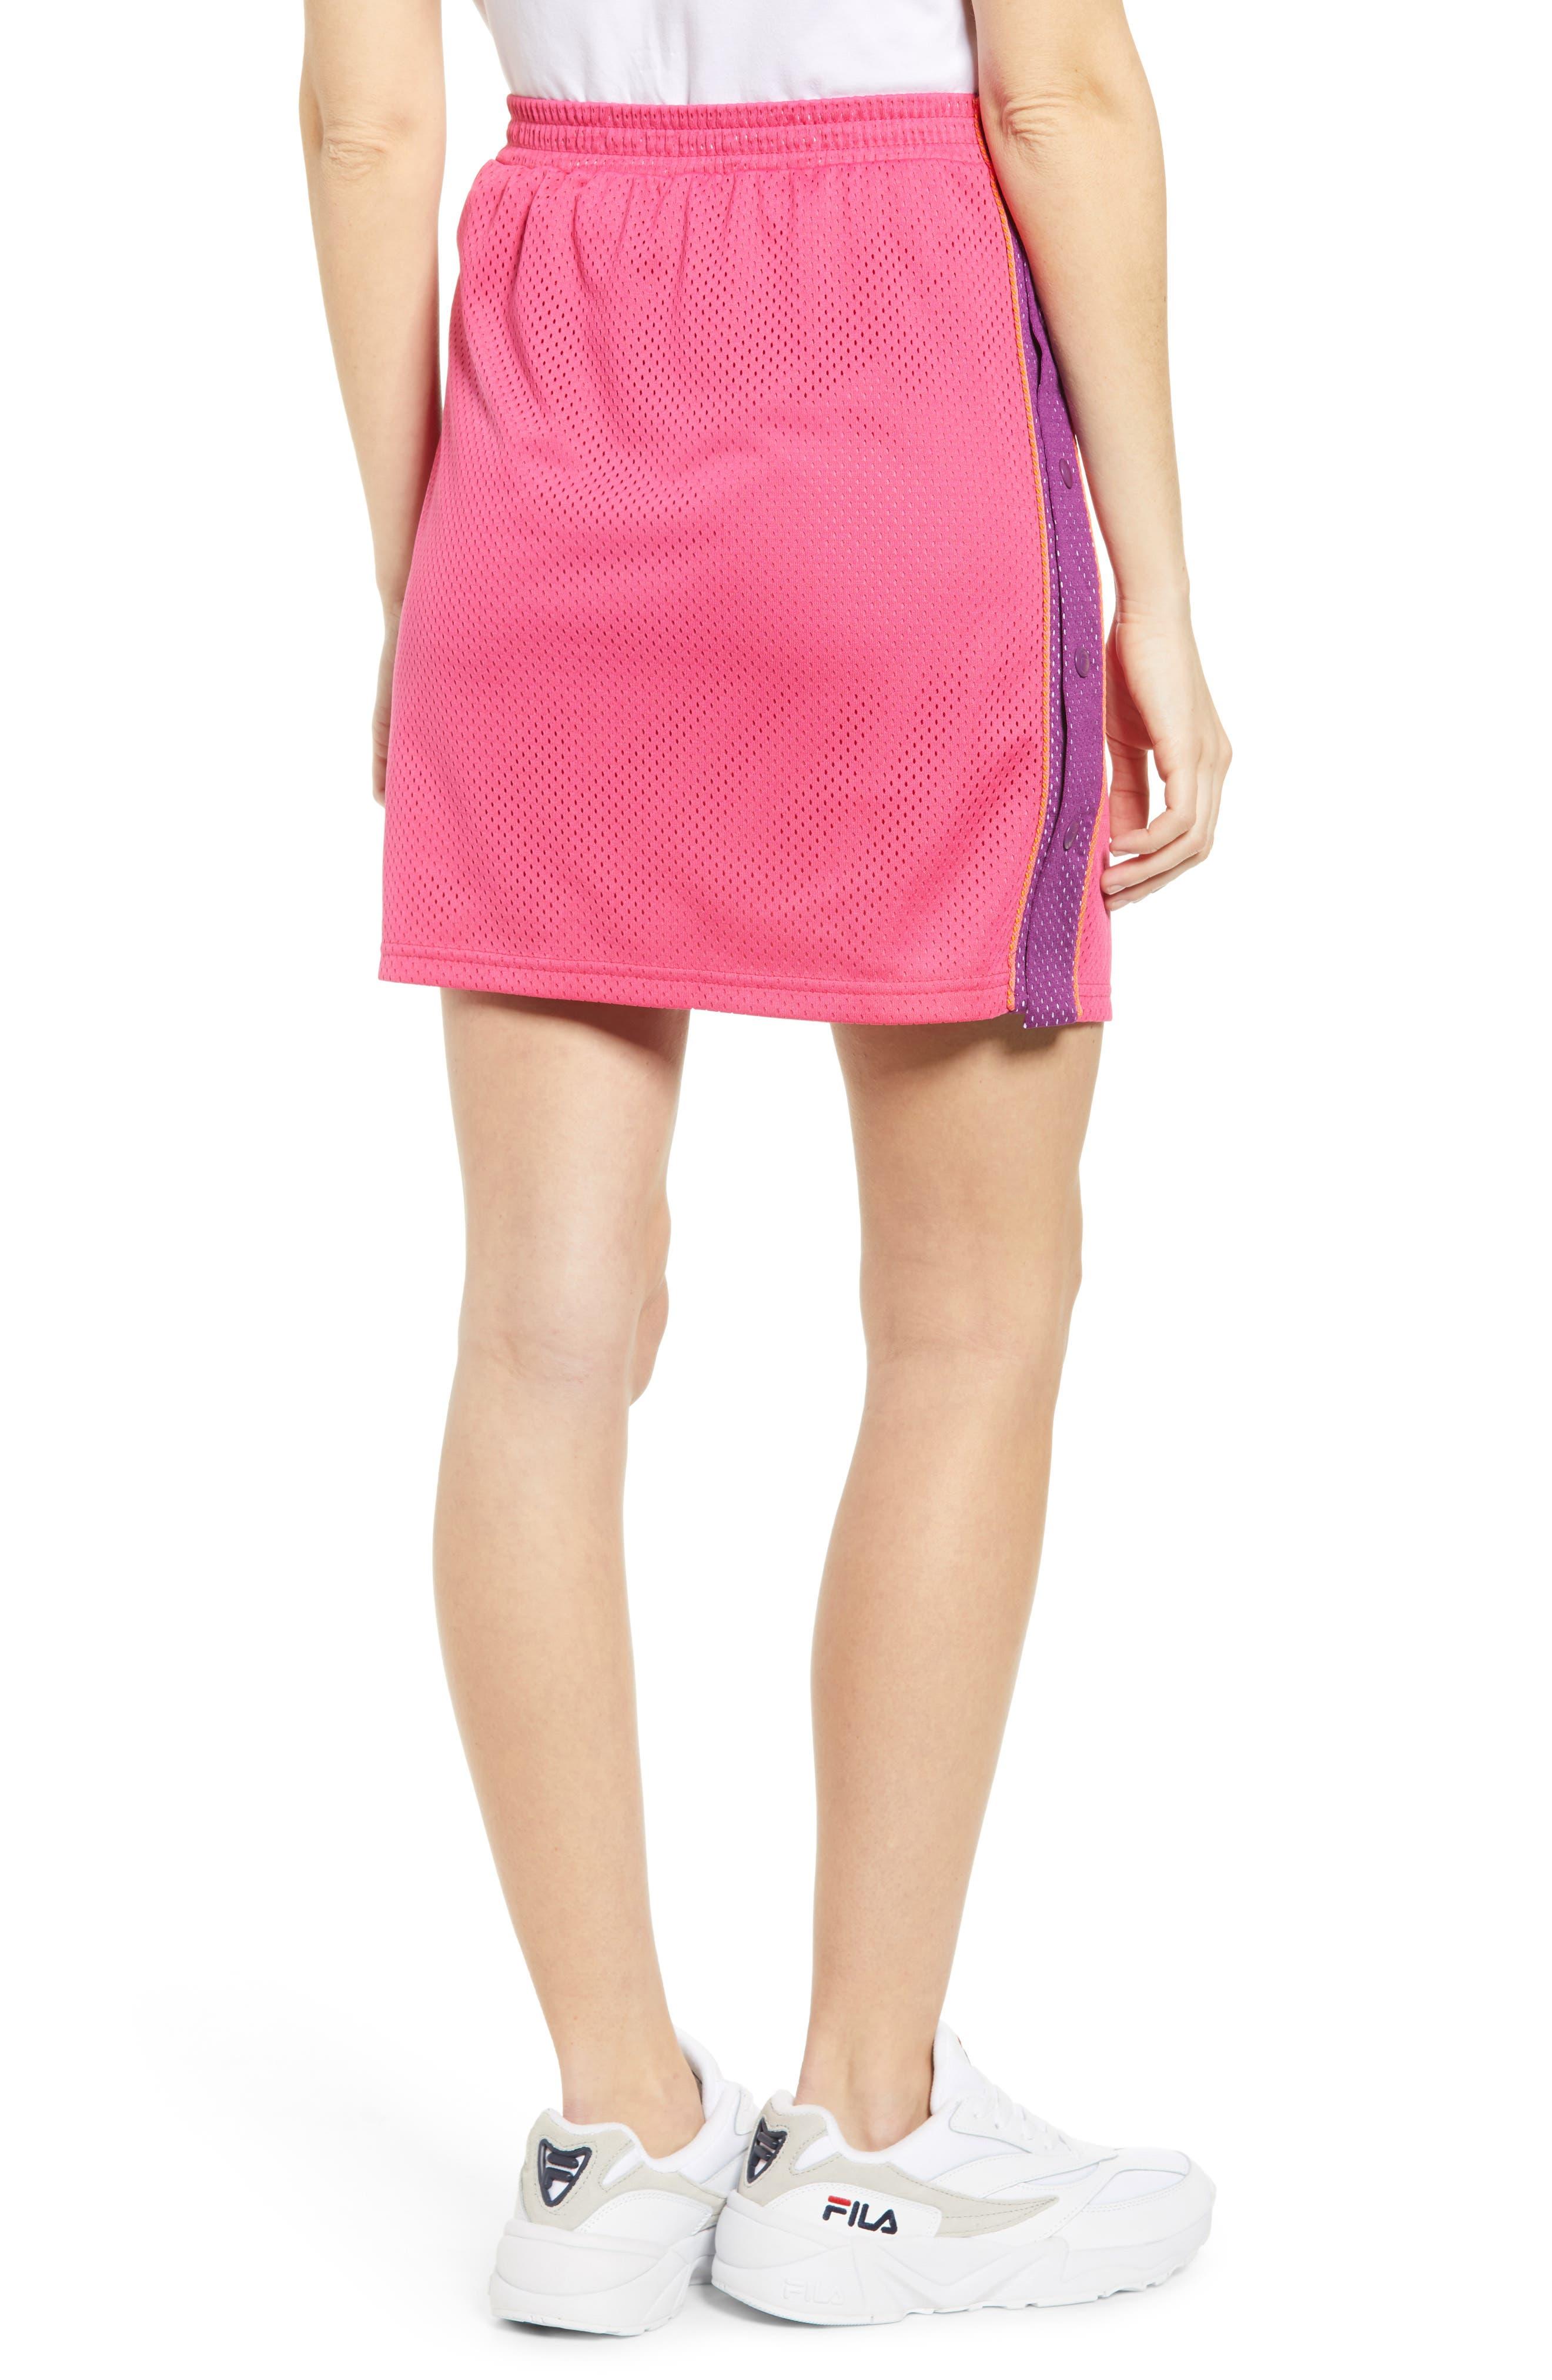 FILA, Miriam Tearaway Miniskirt, Alternate thumbnail 2, color, FUCHSIA PURPLE/ GRAPE/ GREEN